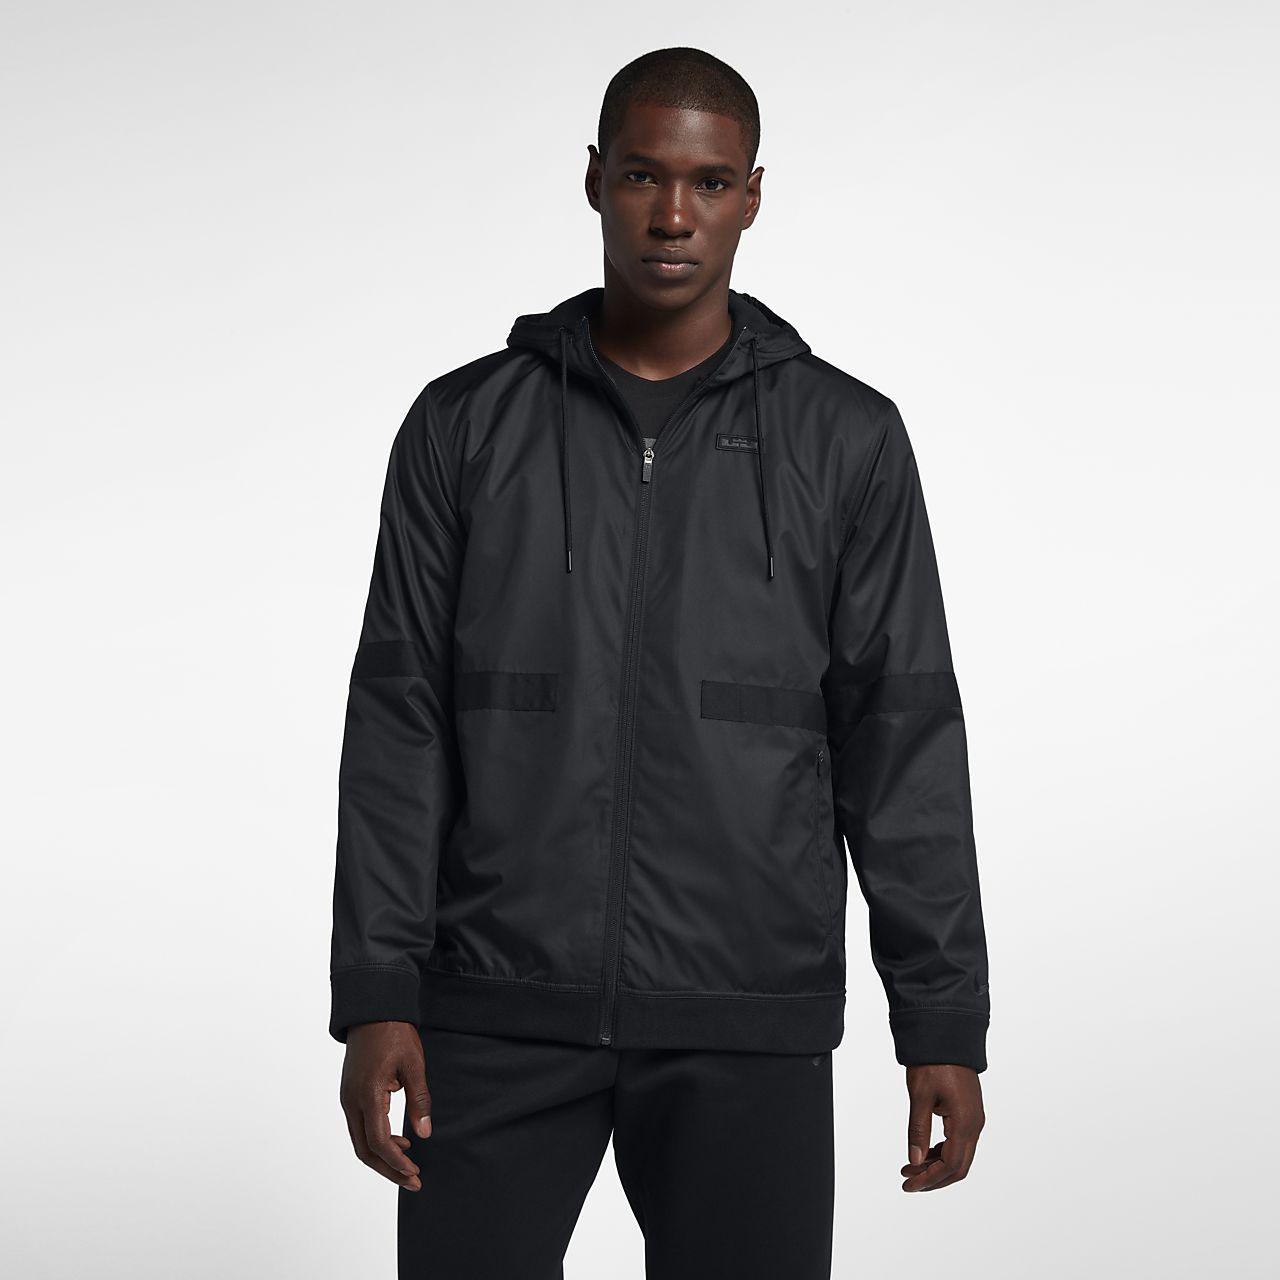 LeBron Men's Jacket